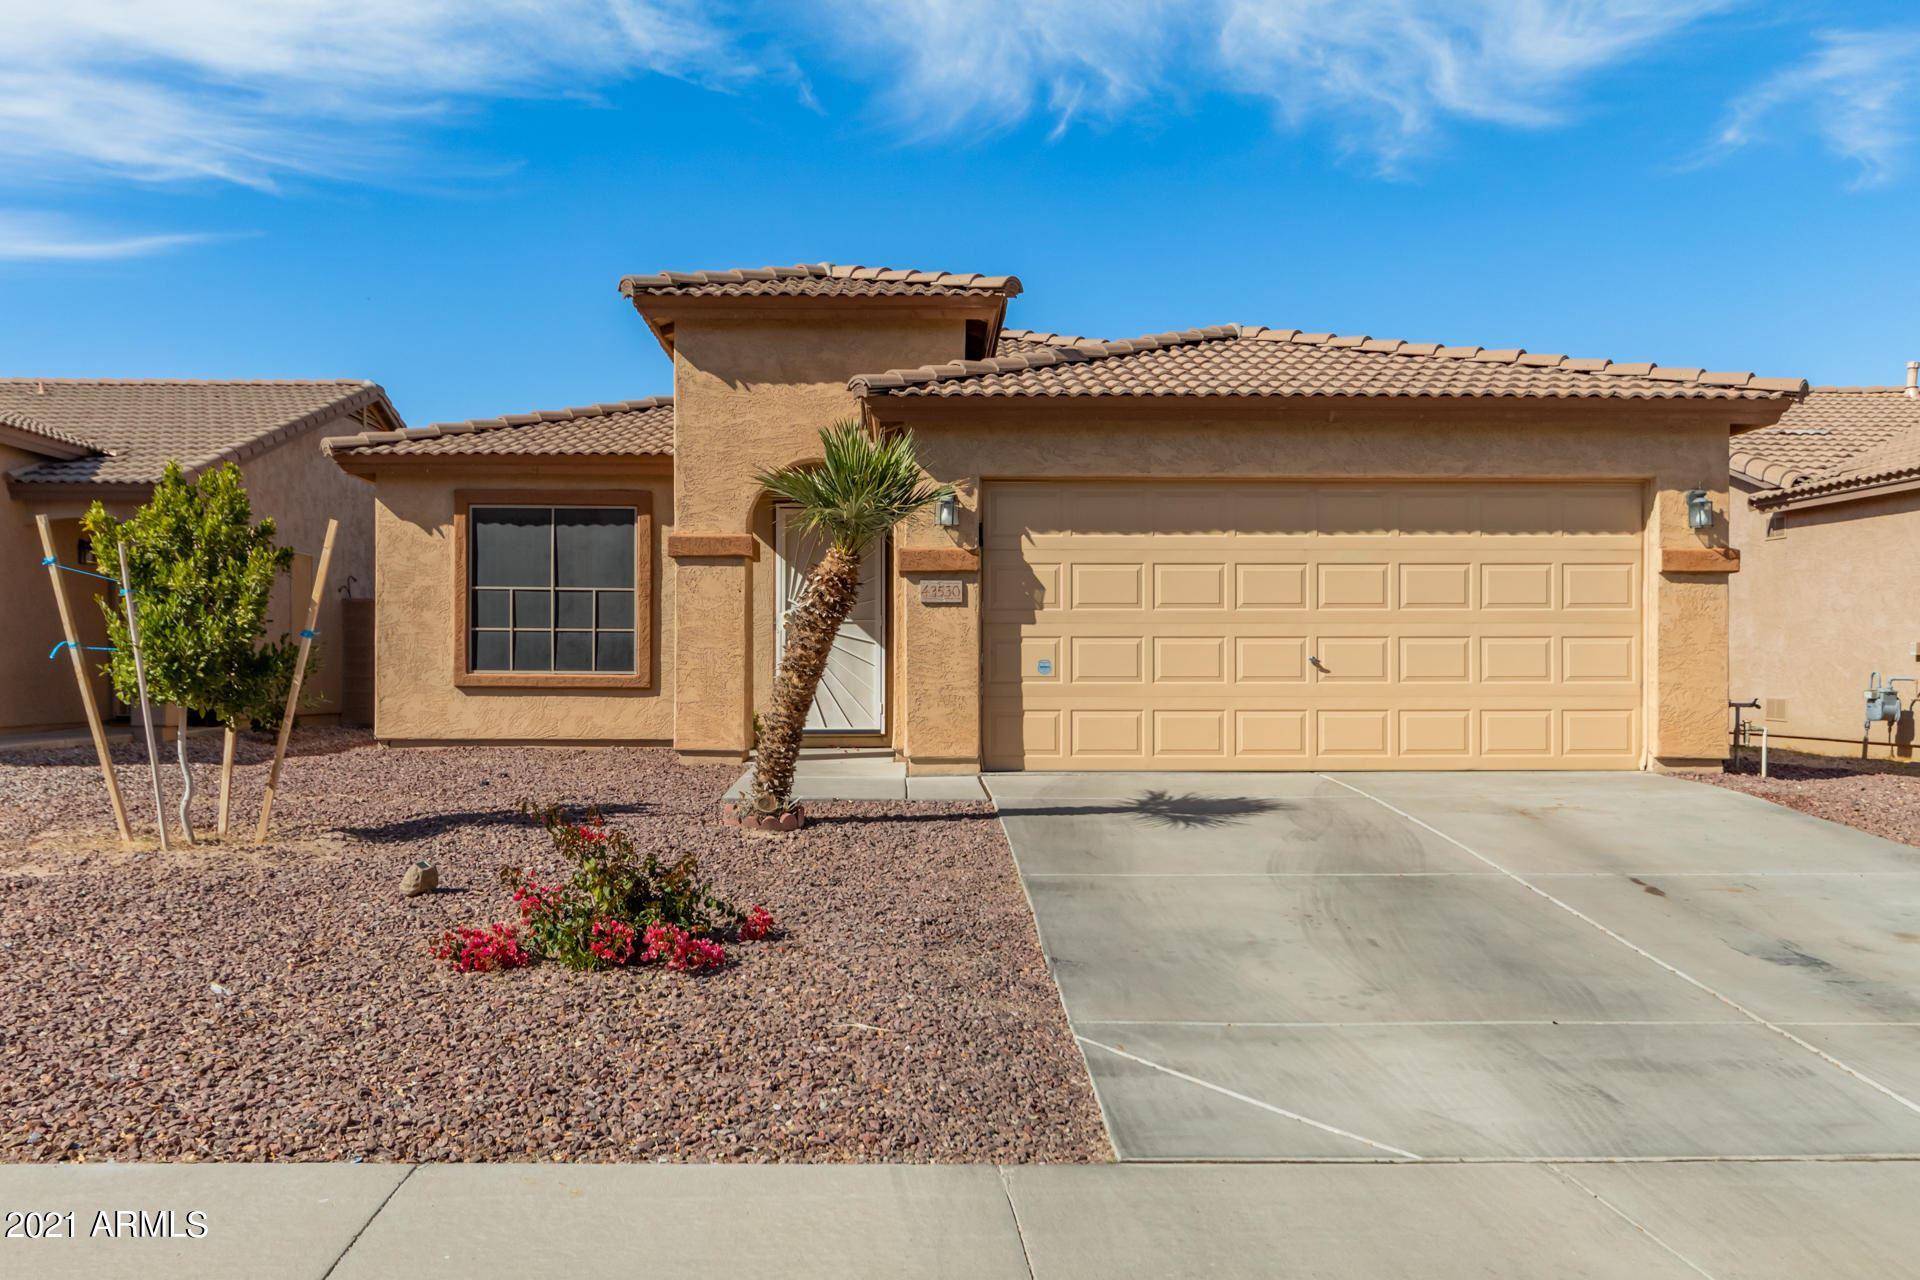 Photo of 43530 W SAGEBRUSH Trail, Maricopa, AZ 85138 (MLS # 6201911)